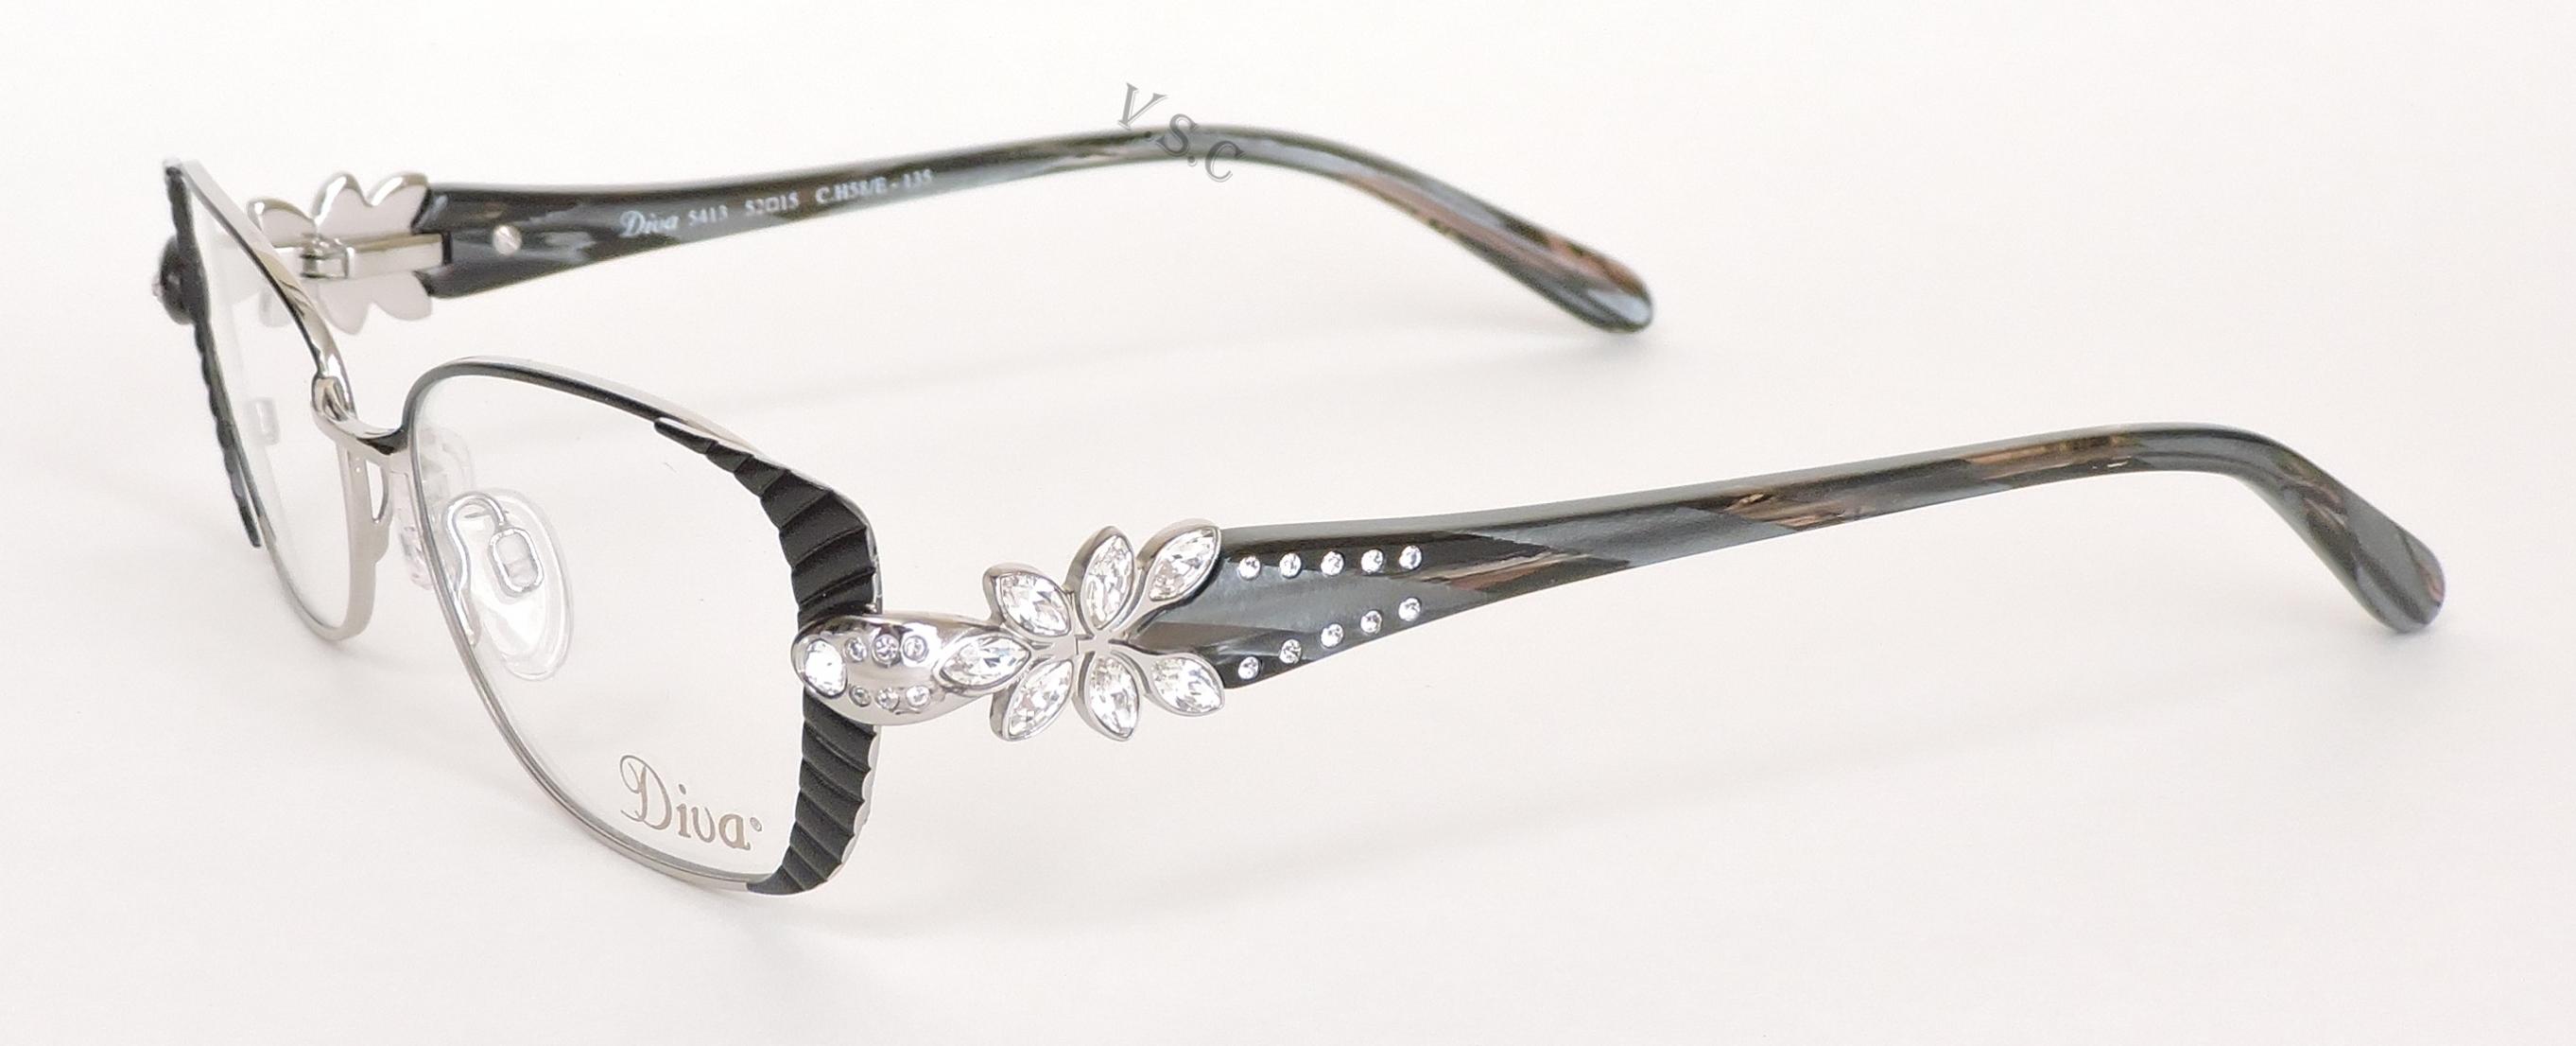 Amazing Diva Eyeglass Frames Pattern - Picture Frame Ideas ...